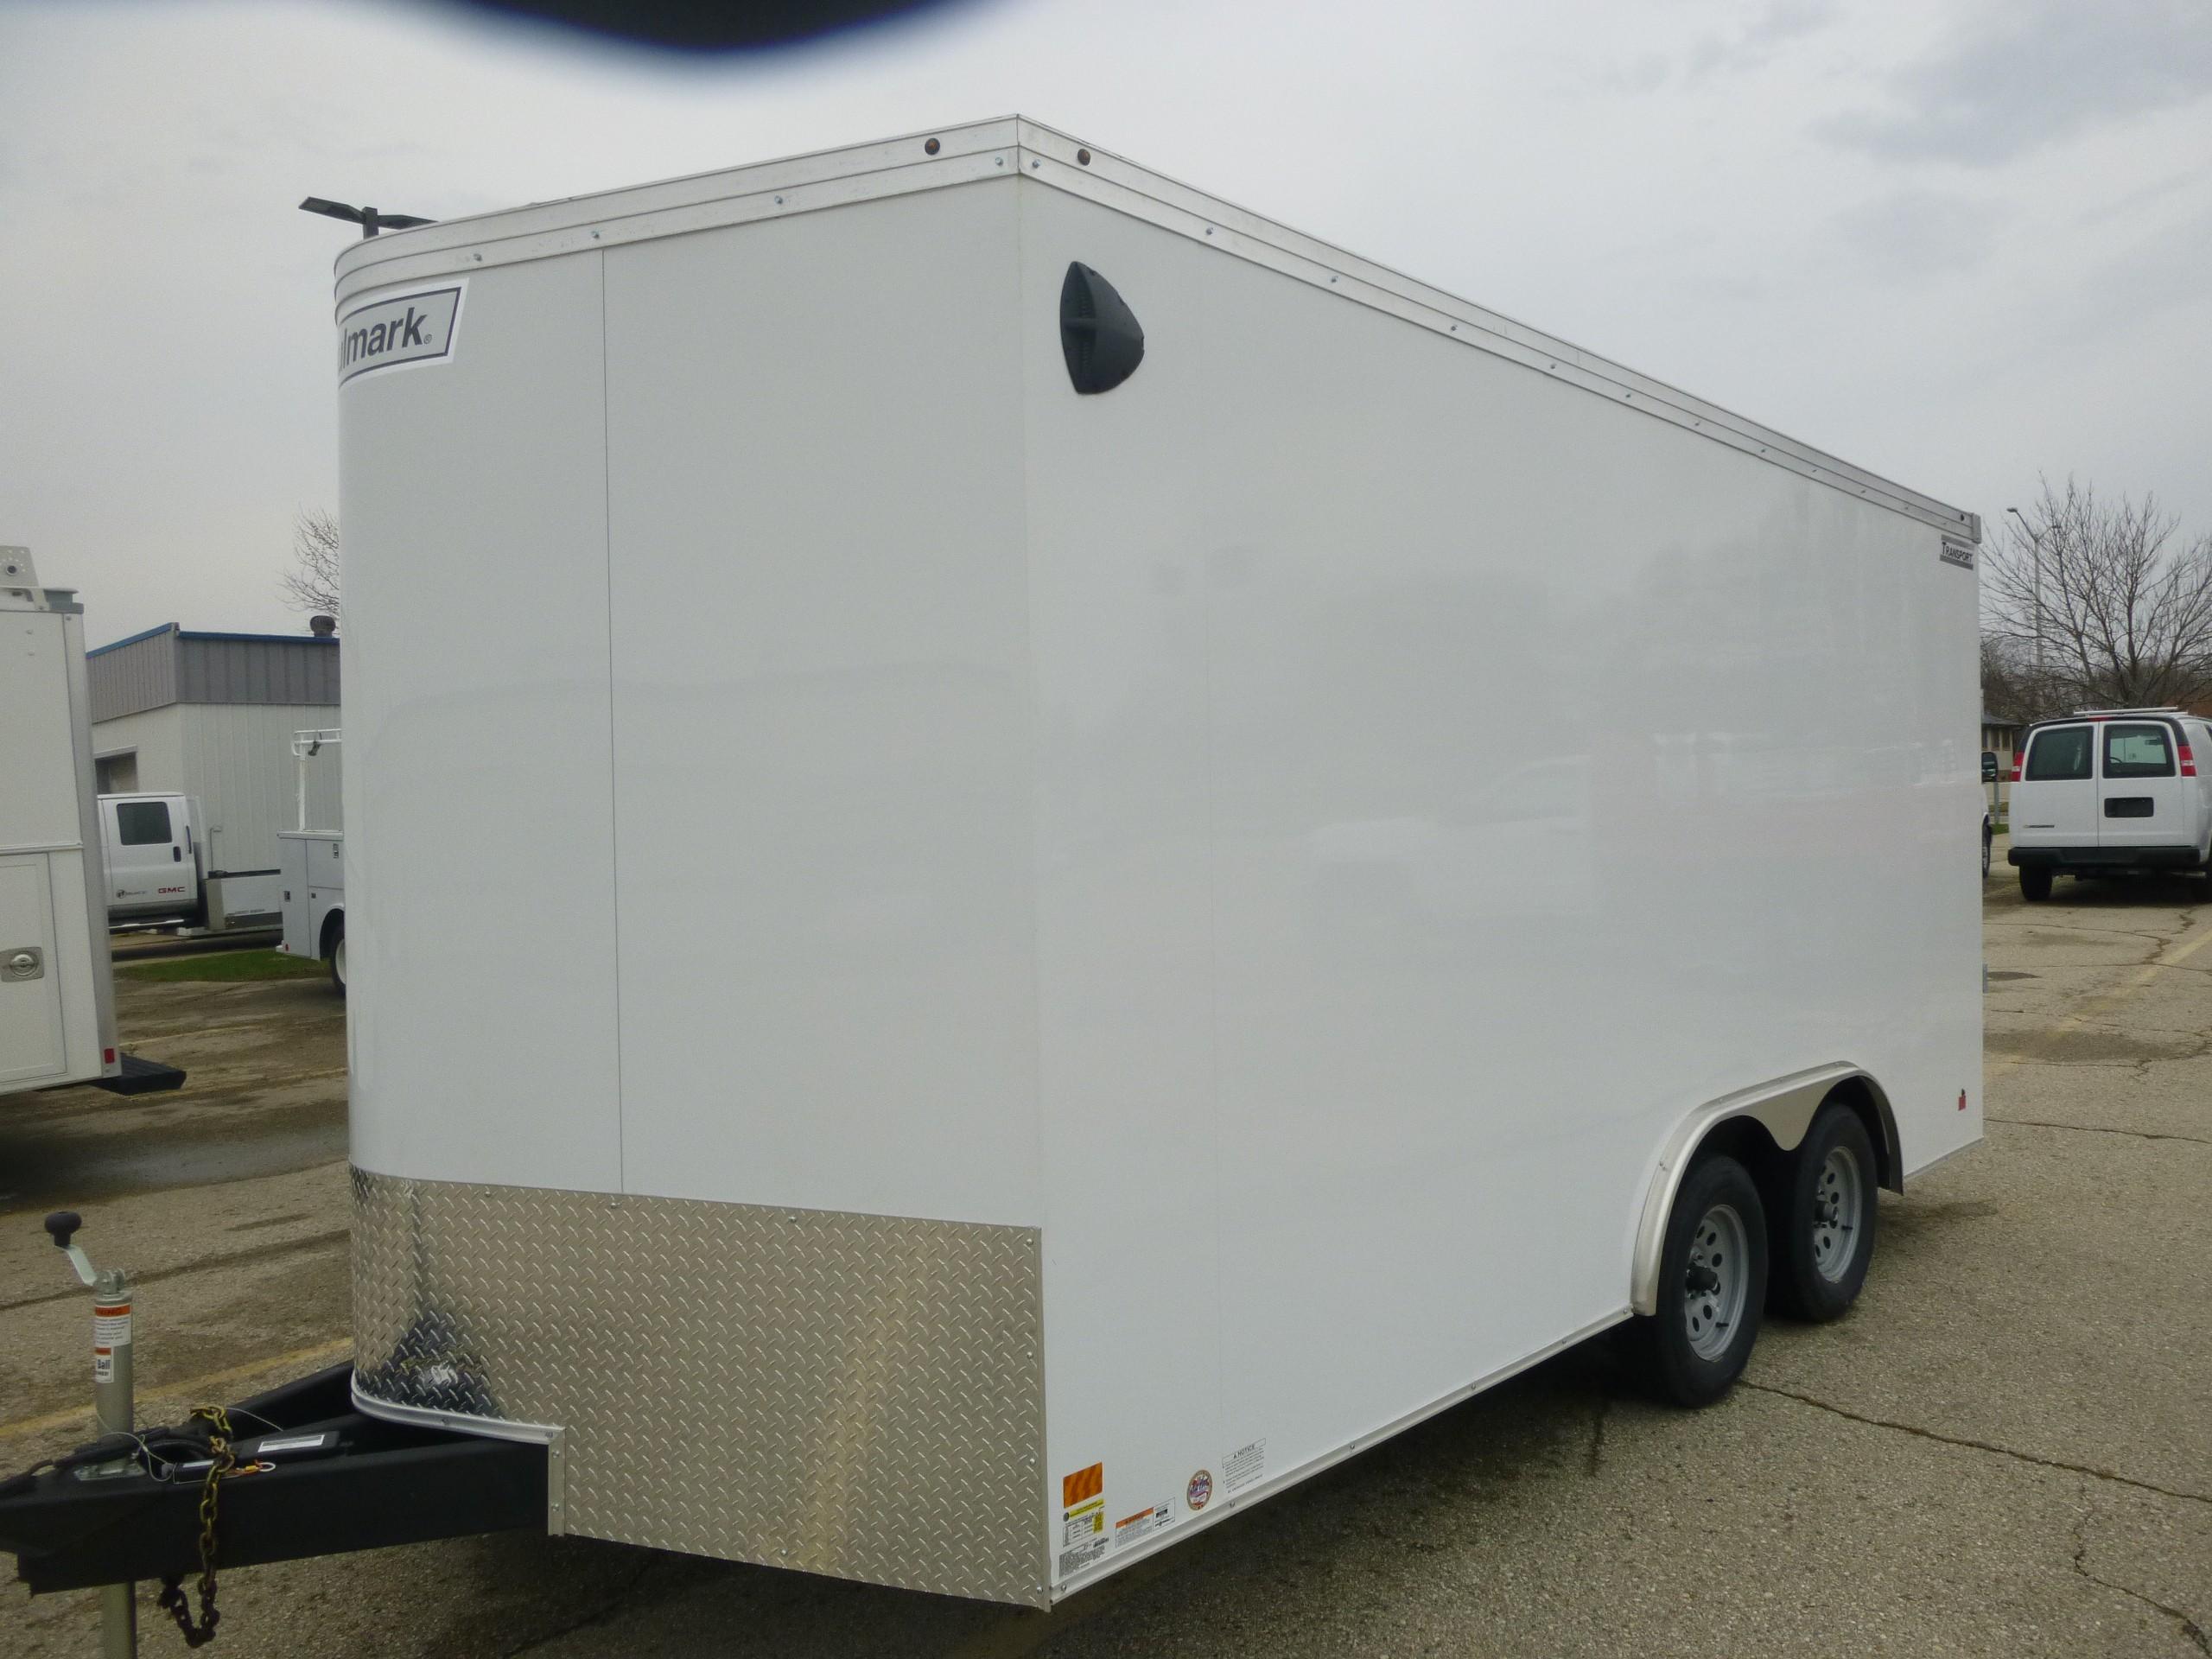 New, 2019, Haulmark, 8'6 x 16' Transport V, Trailers